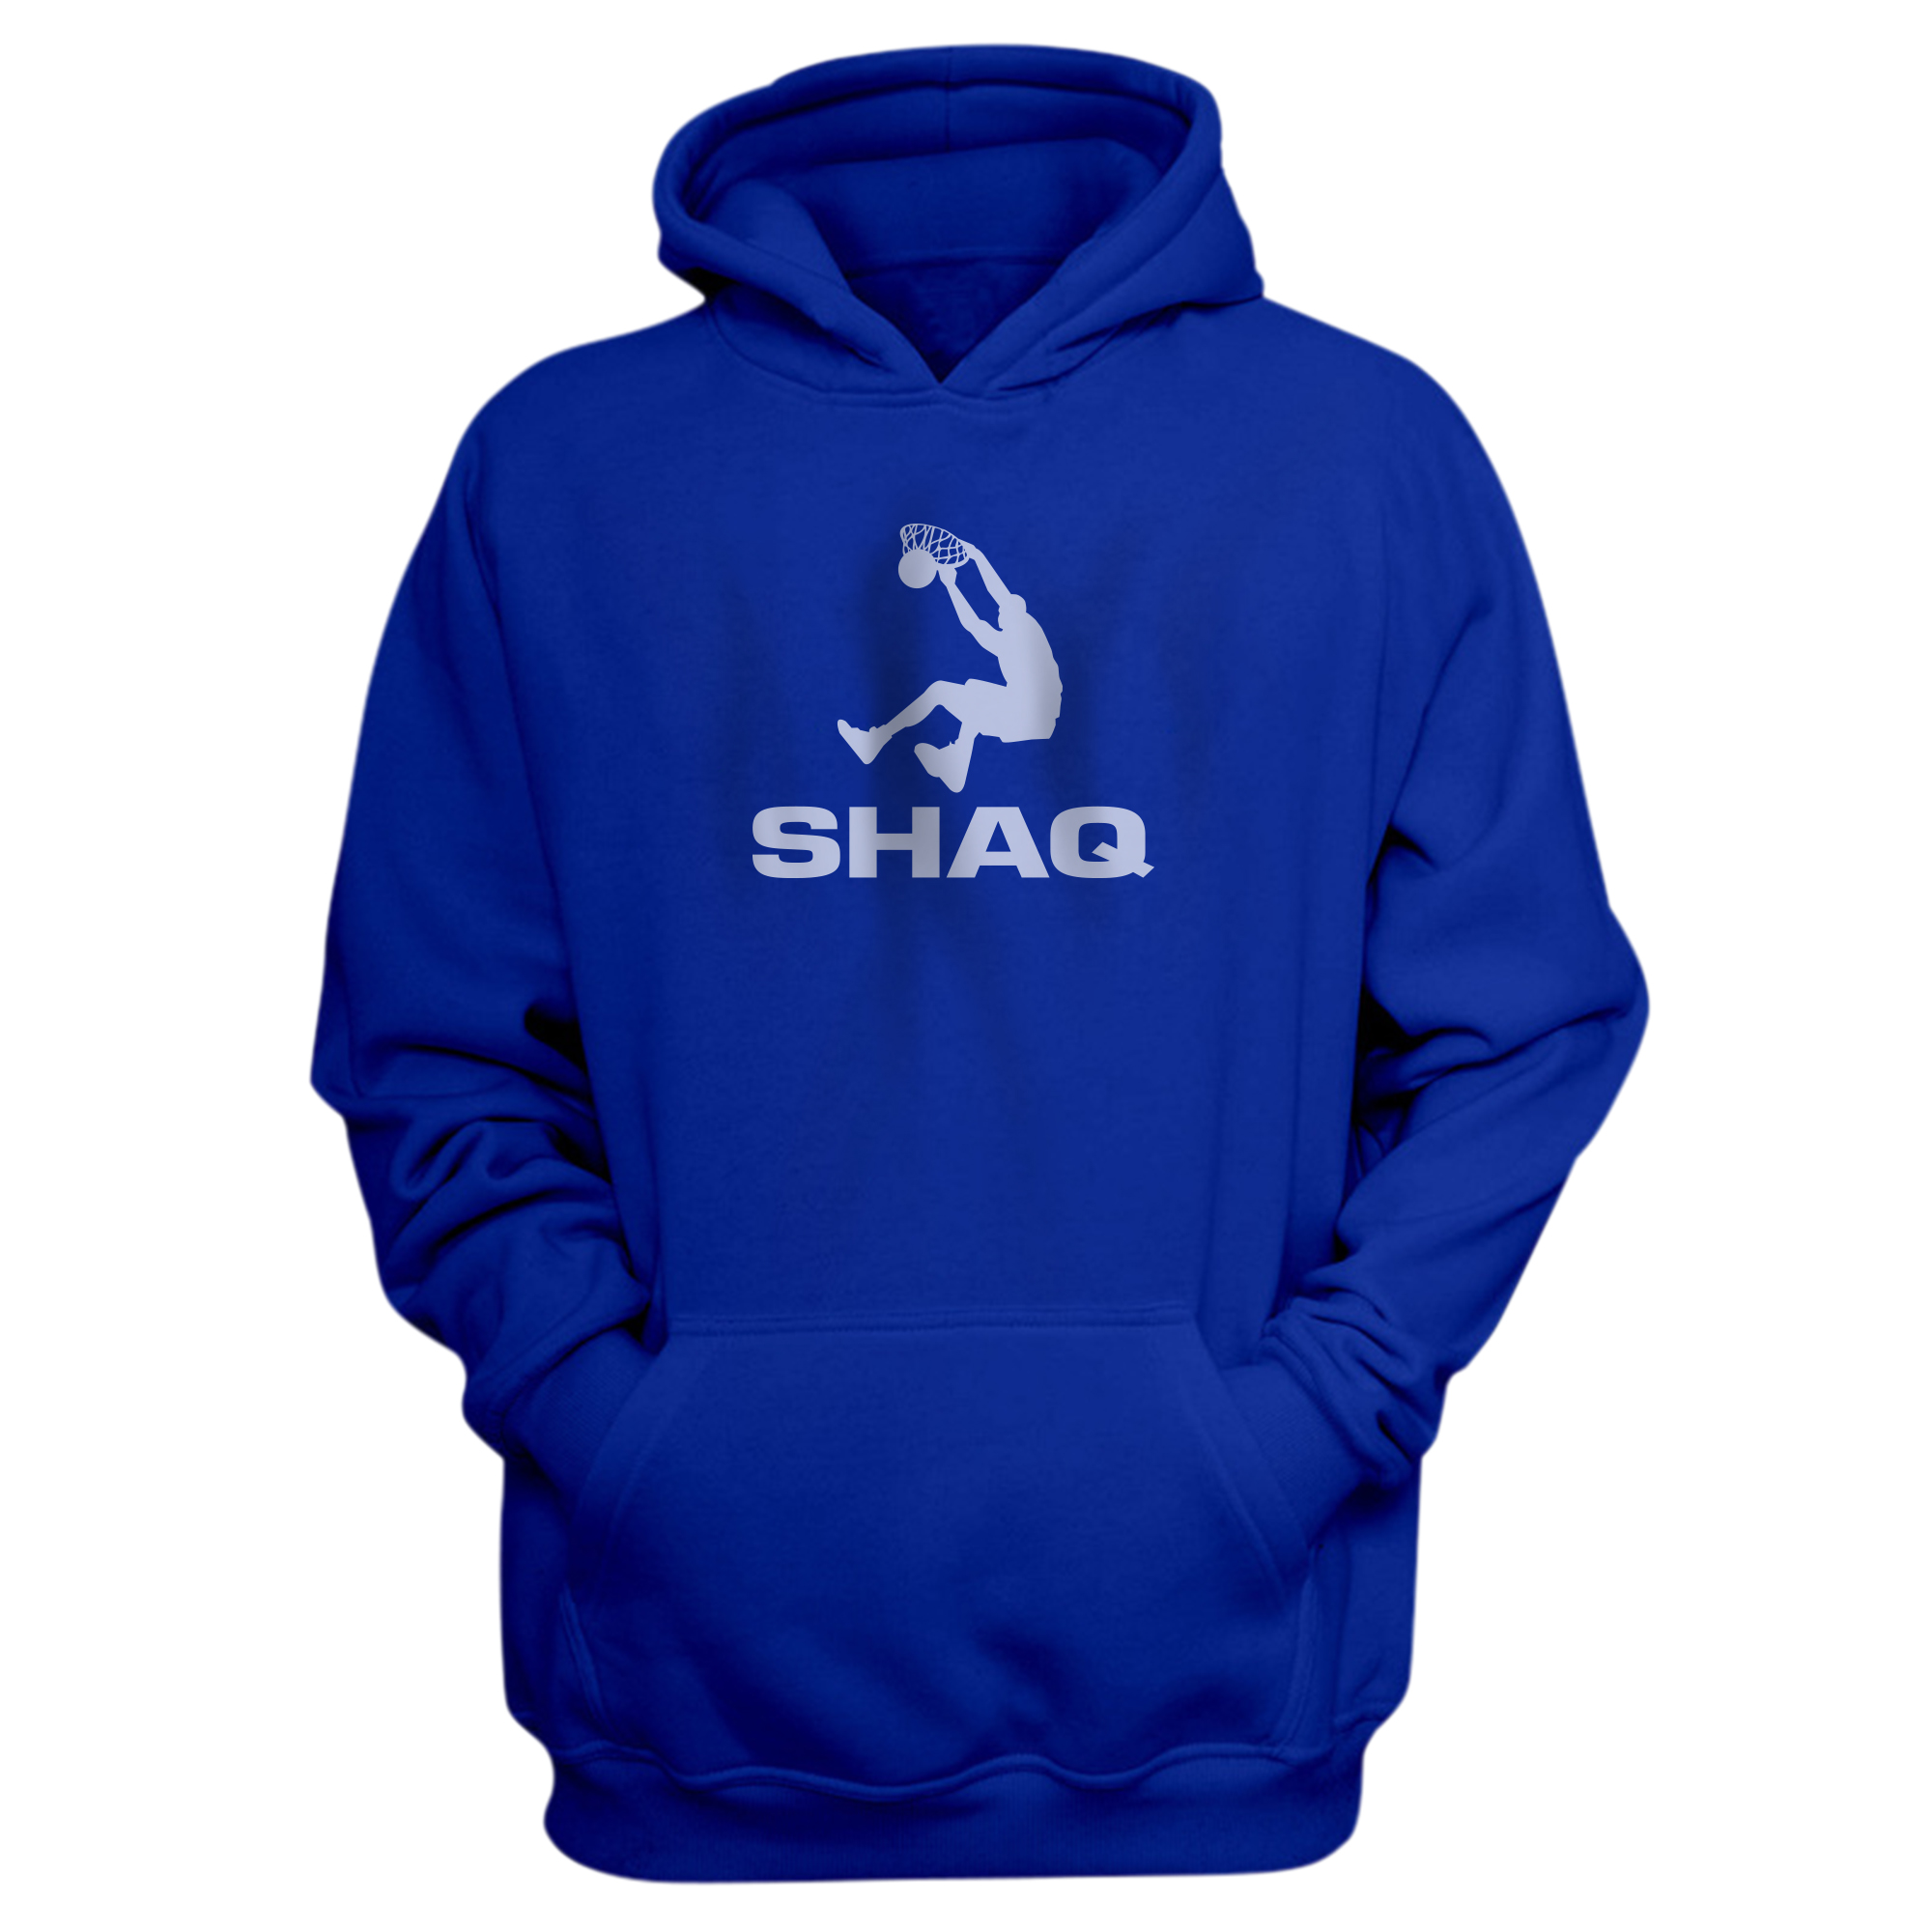 Shaquille O'Neal Hoodie (HD-BLU-NP-393-ShaquilleO'Neal)